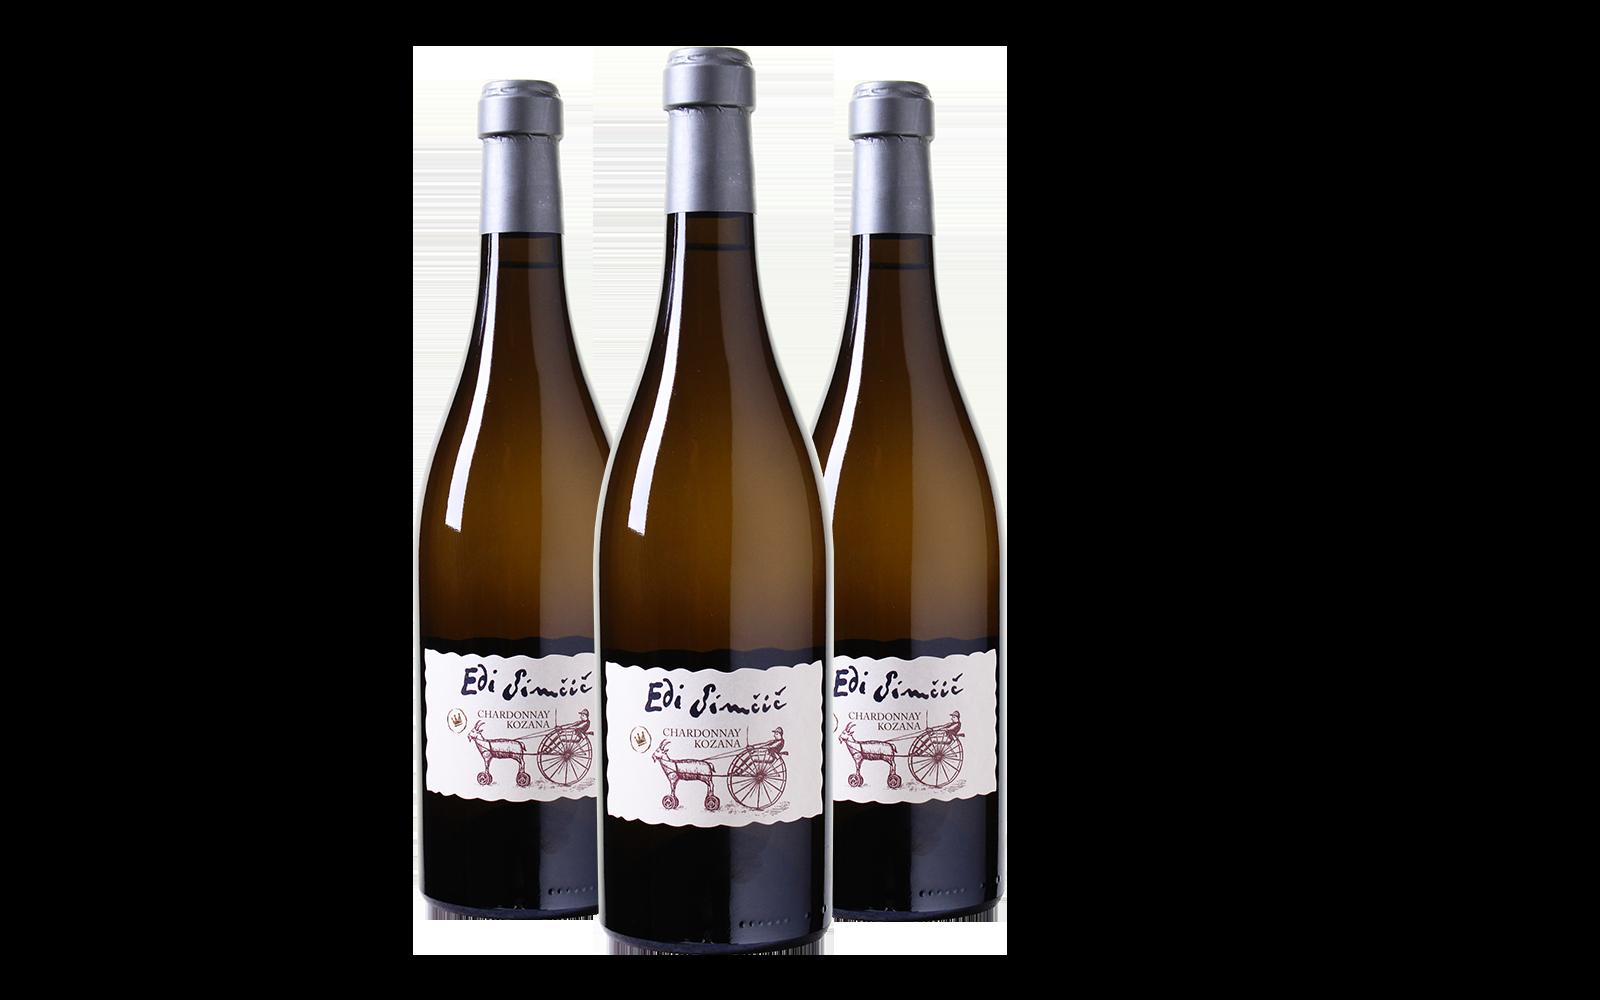 Edi Simcic 'Kozana' Chardonnay